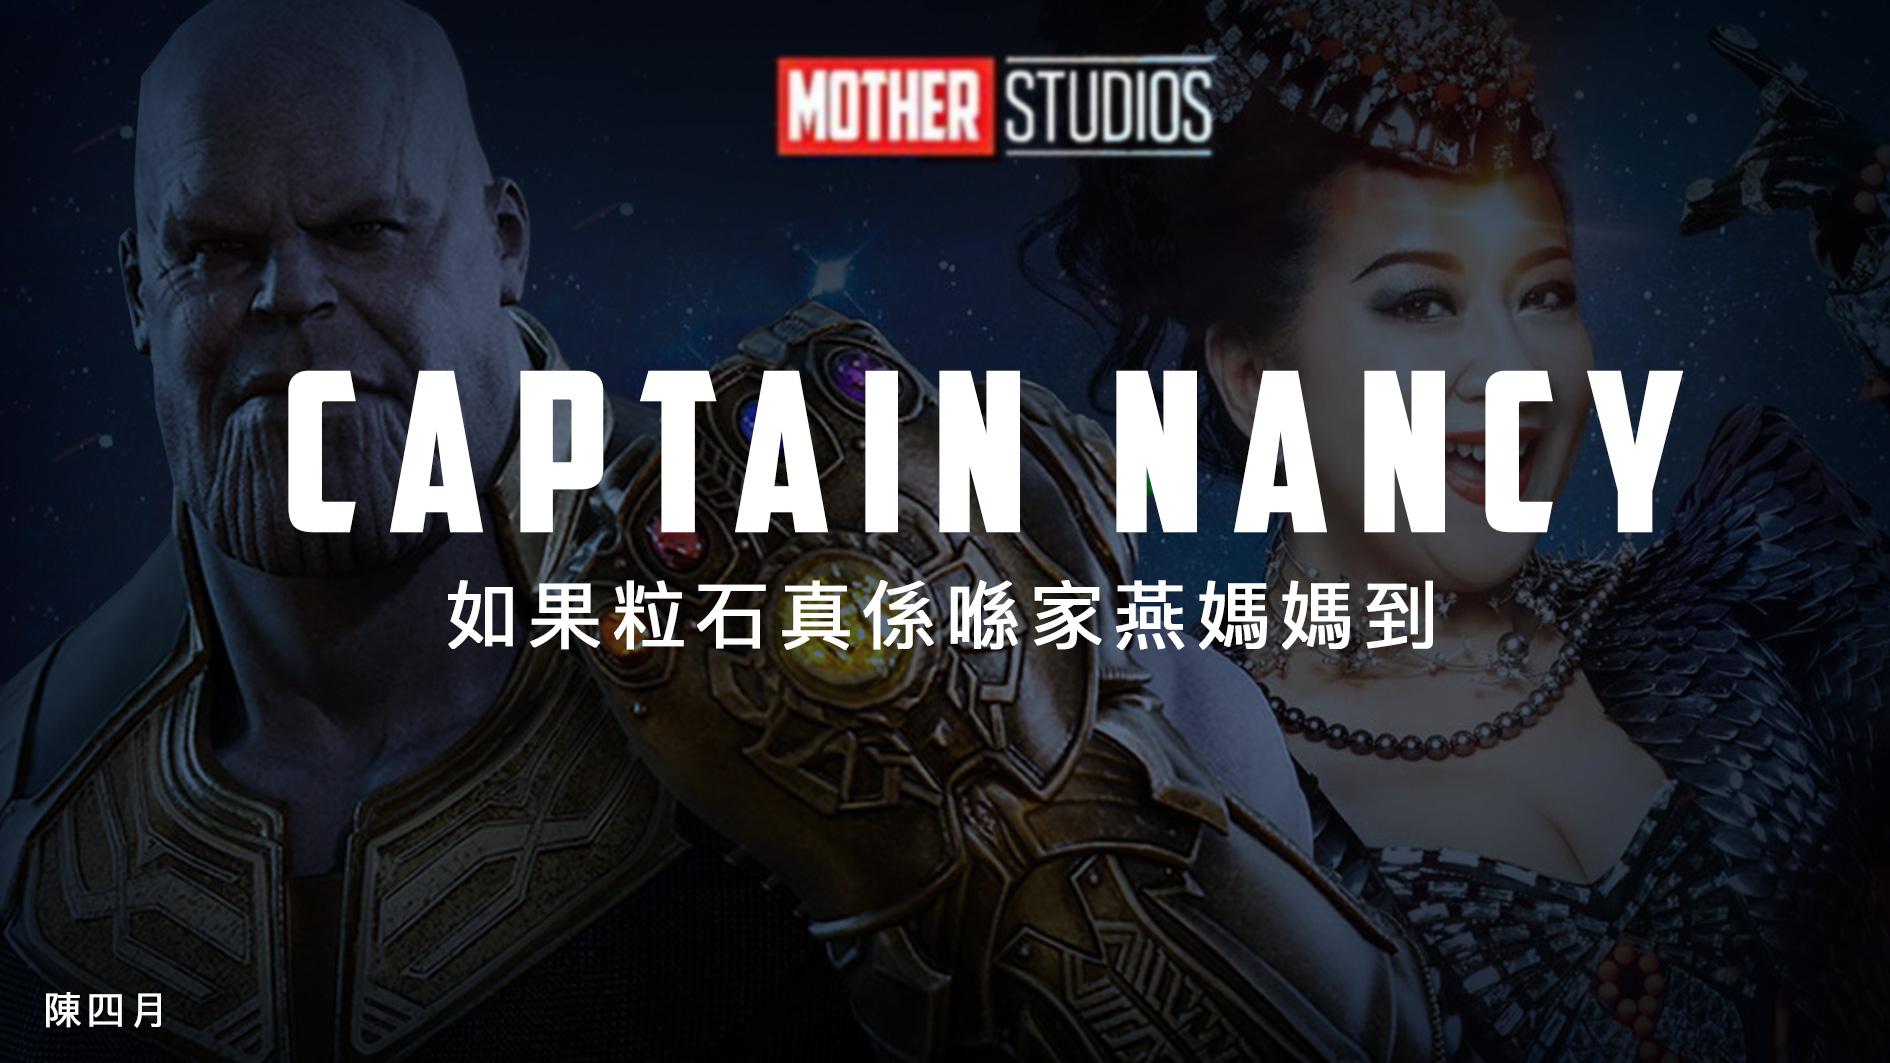 「Captain Nancy」如果粒石真係喺家燕媽媽到